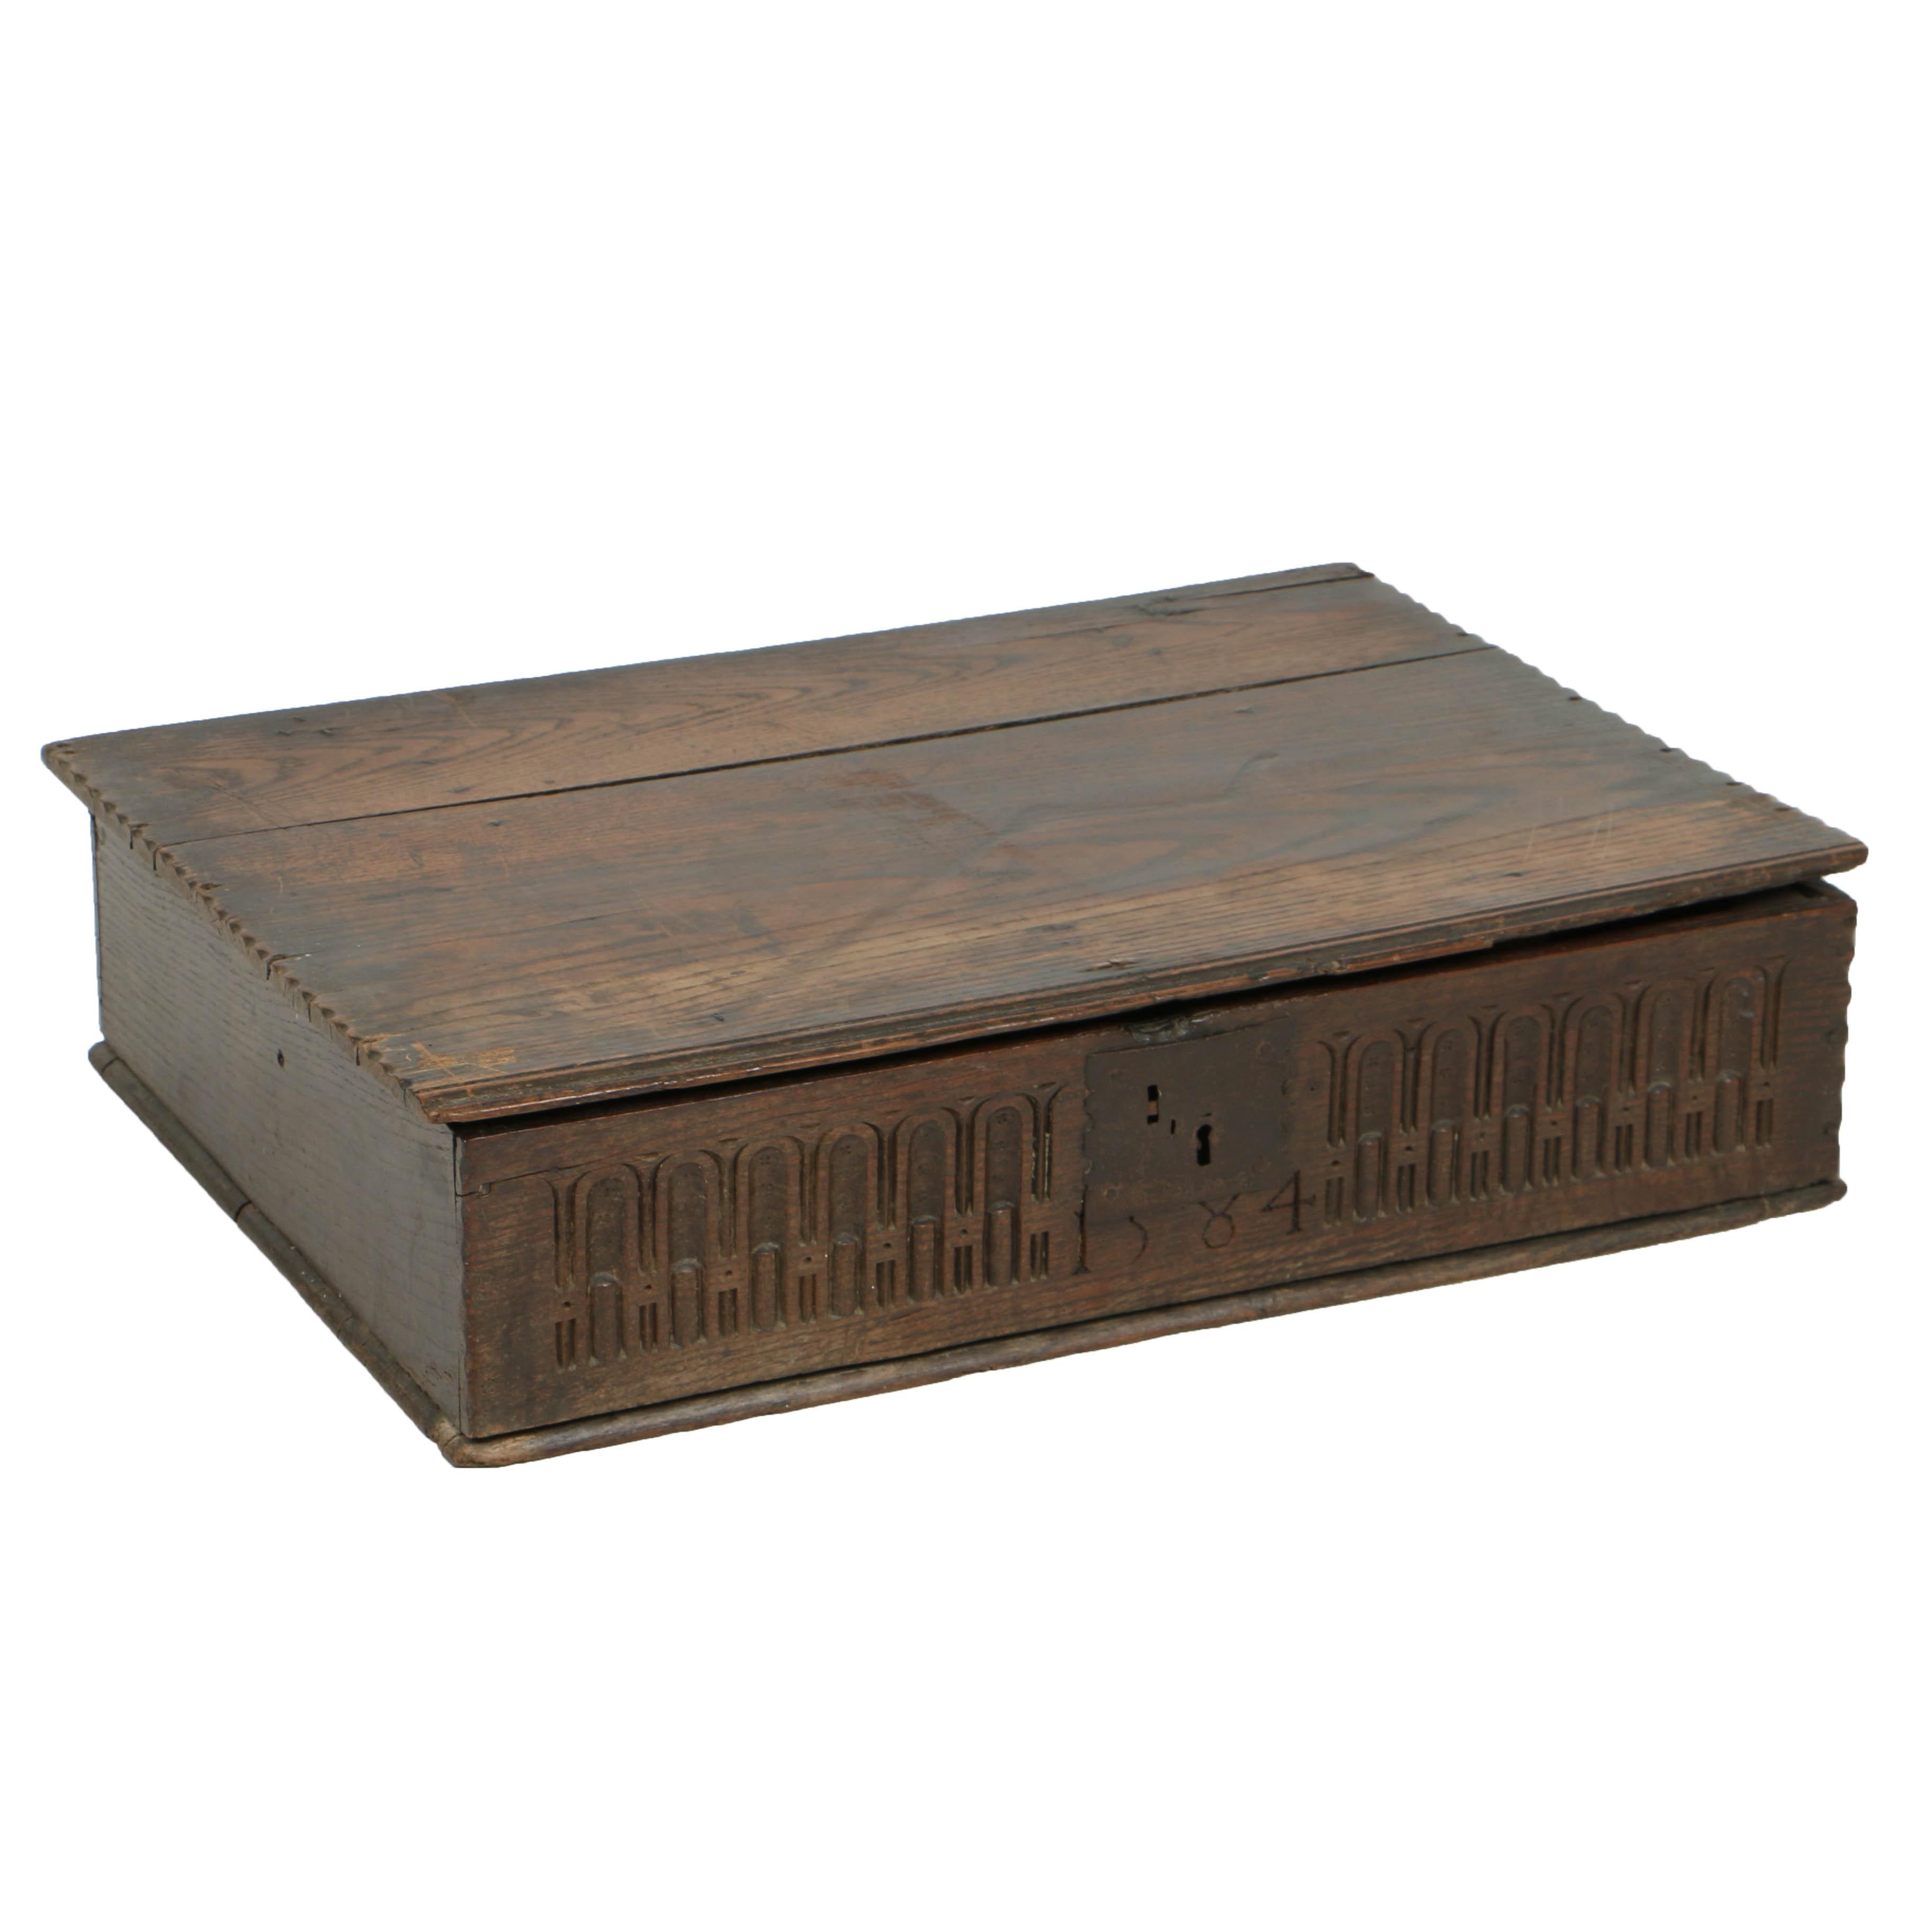 Antique Elizabethan Carved Oak Box, Late 16th Century